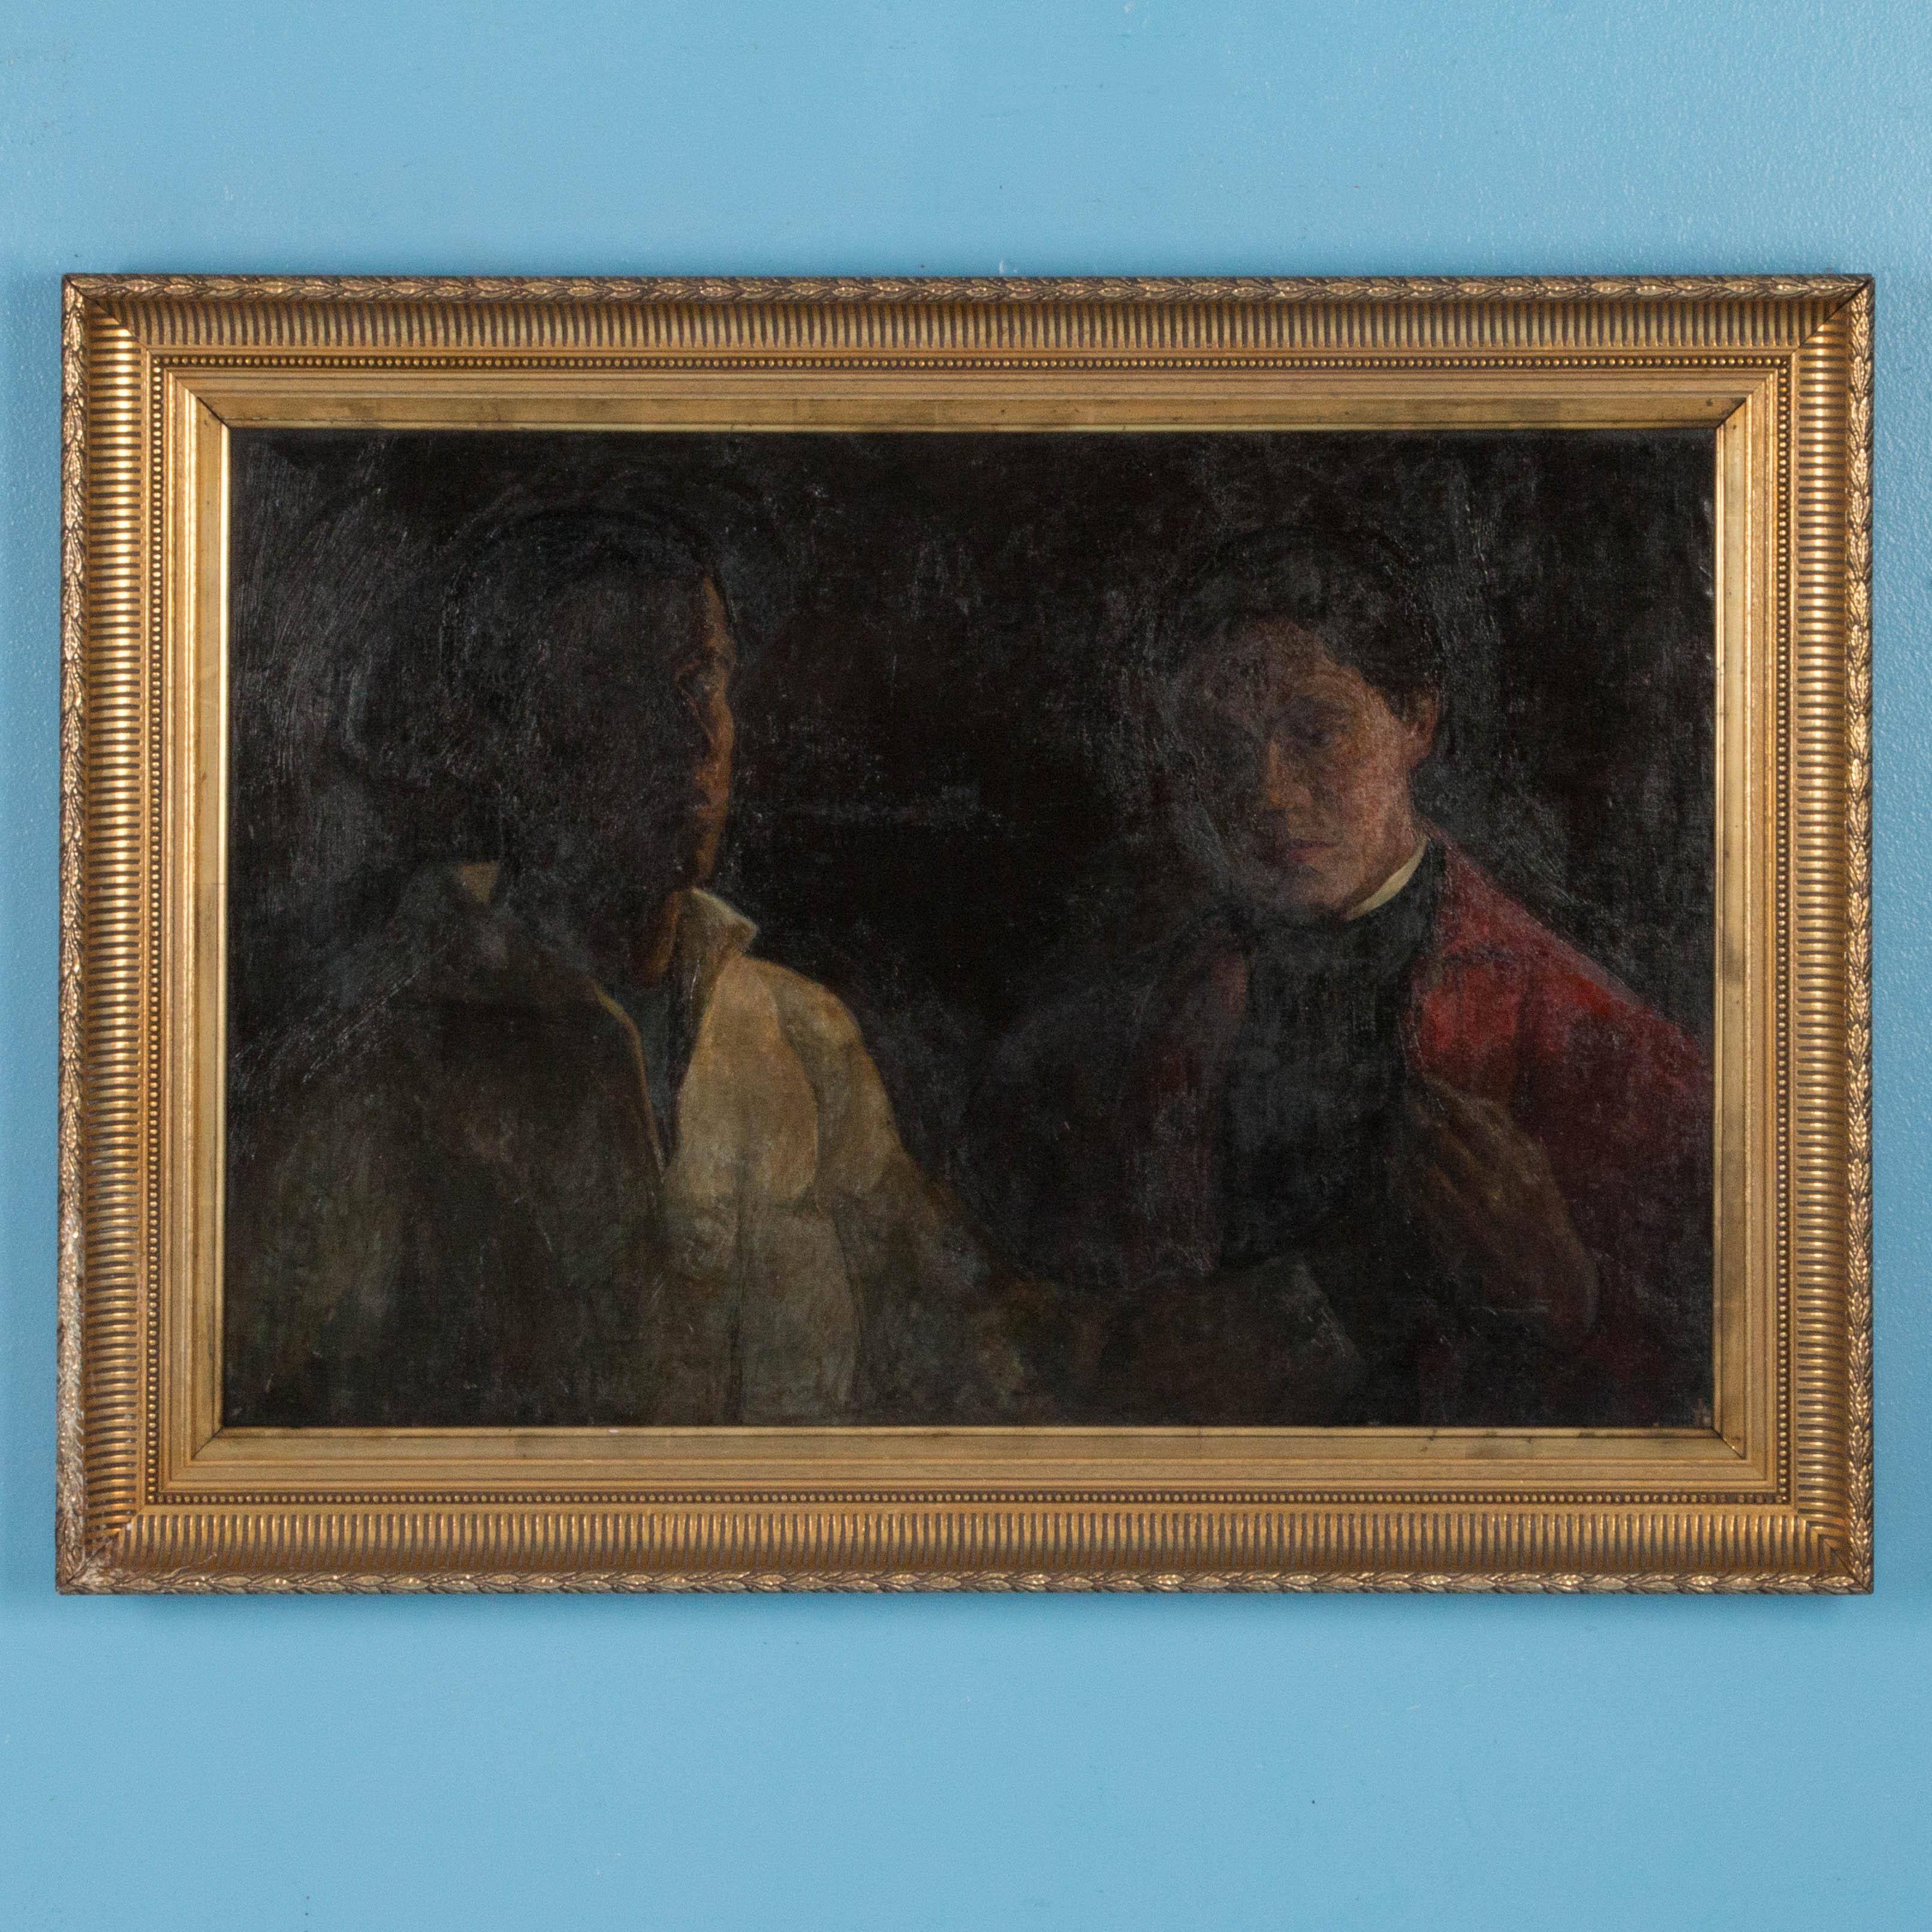 Antique 19th Century Oil Painting Portrait By Sigurd Wandel